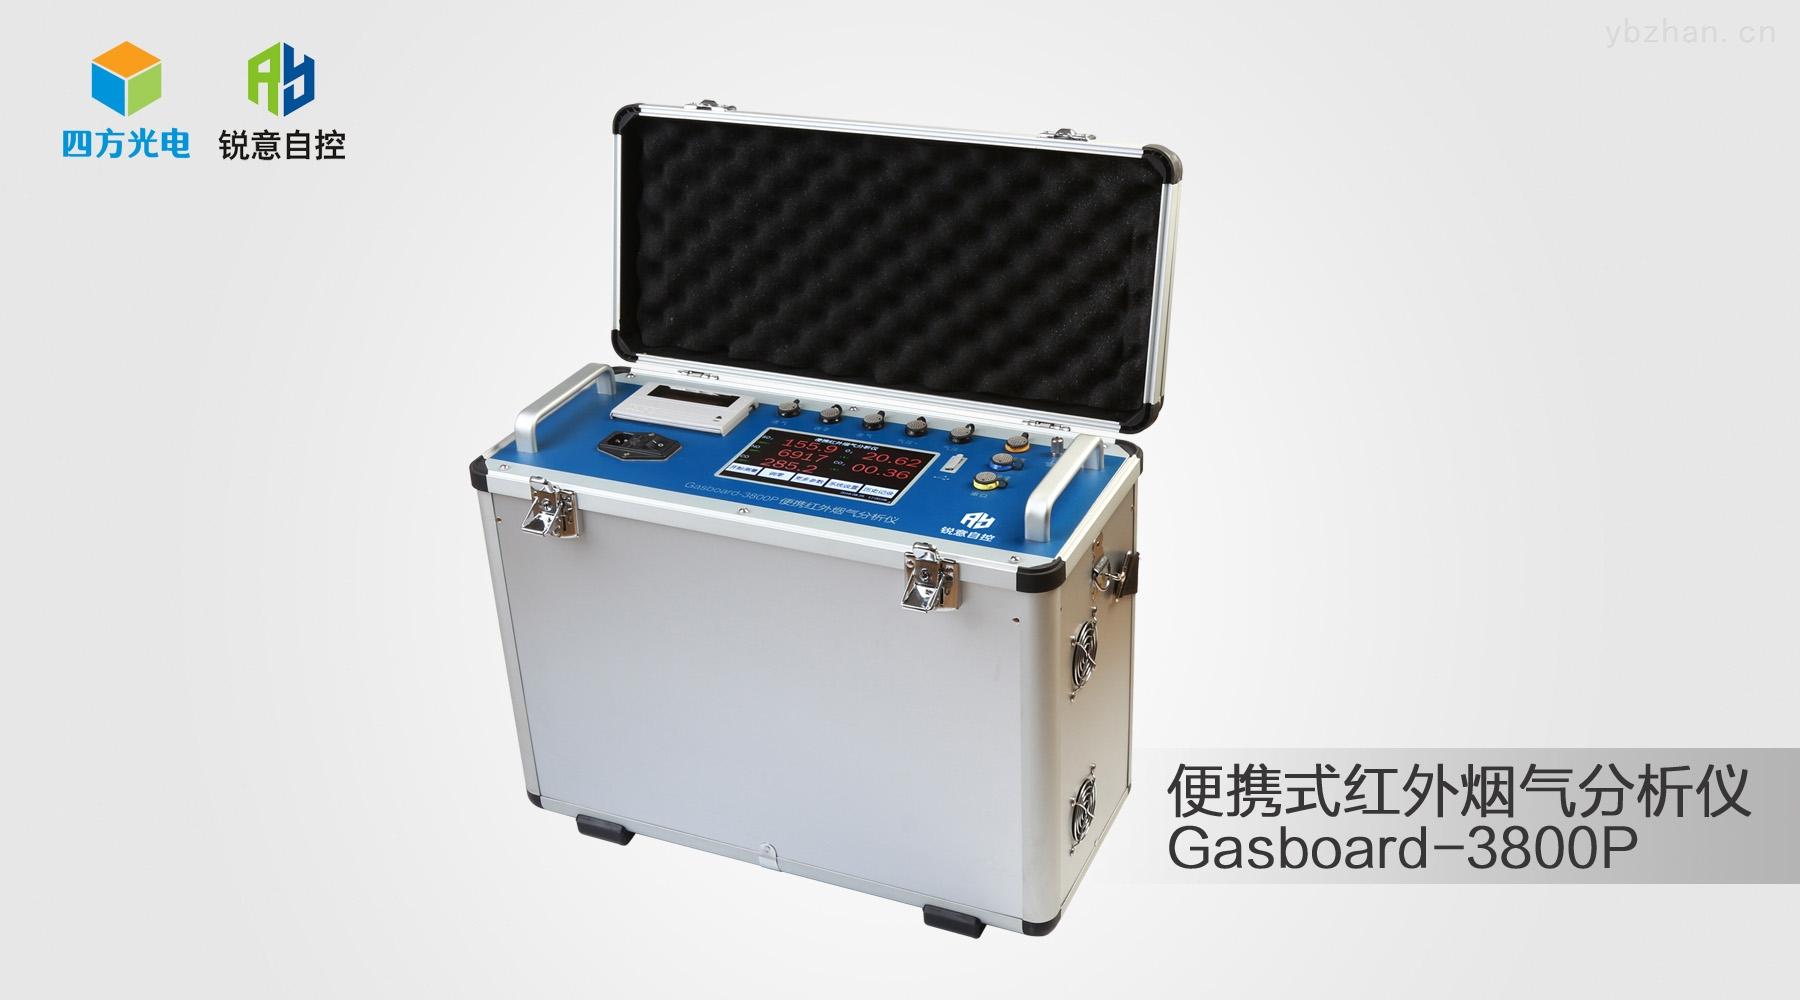 Gasboard-3800P-銳意自控便攜式紅外煙氣分析儀